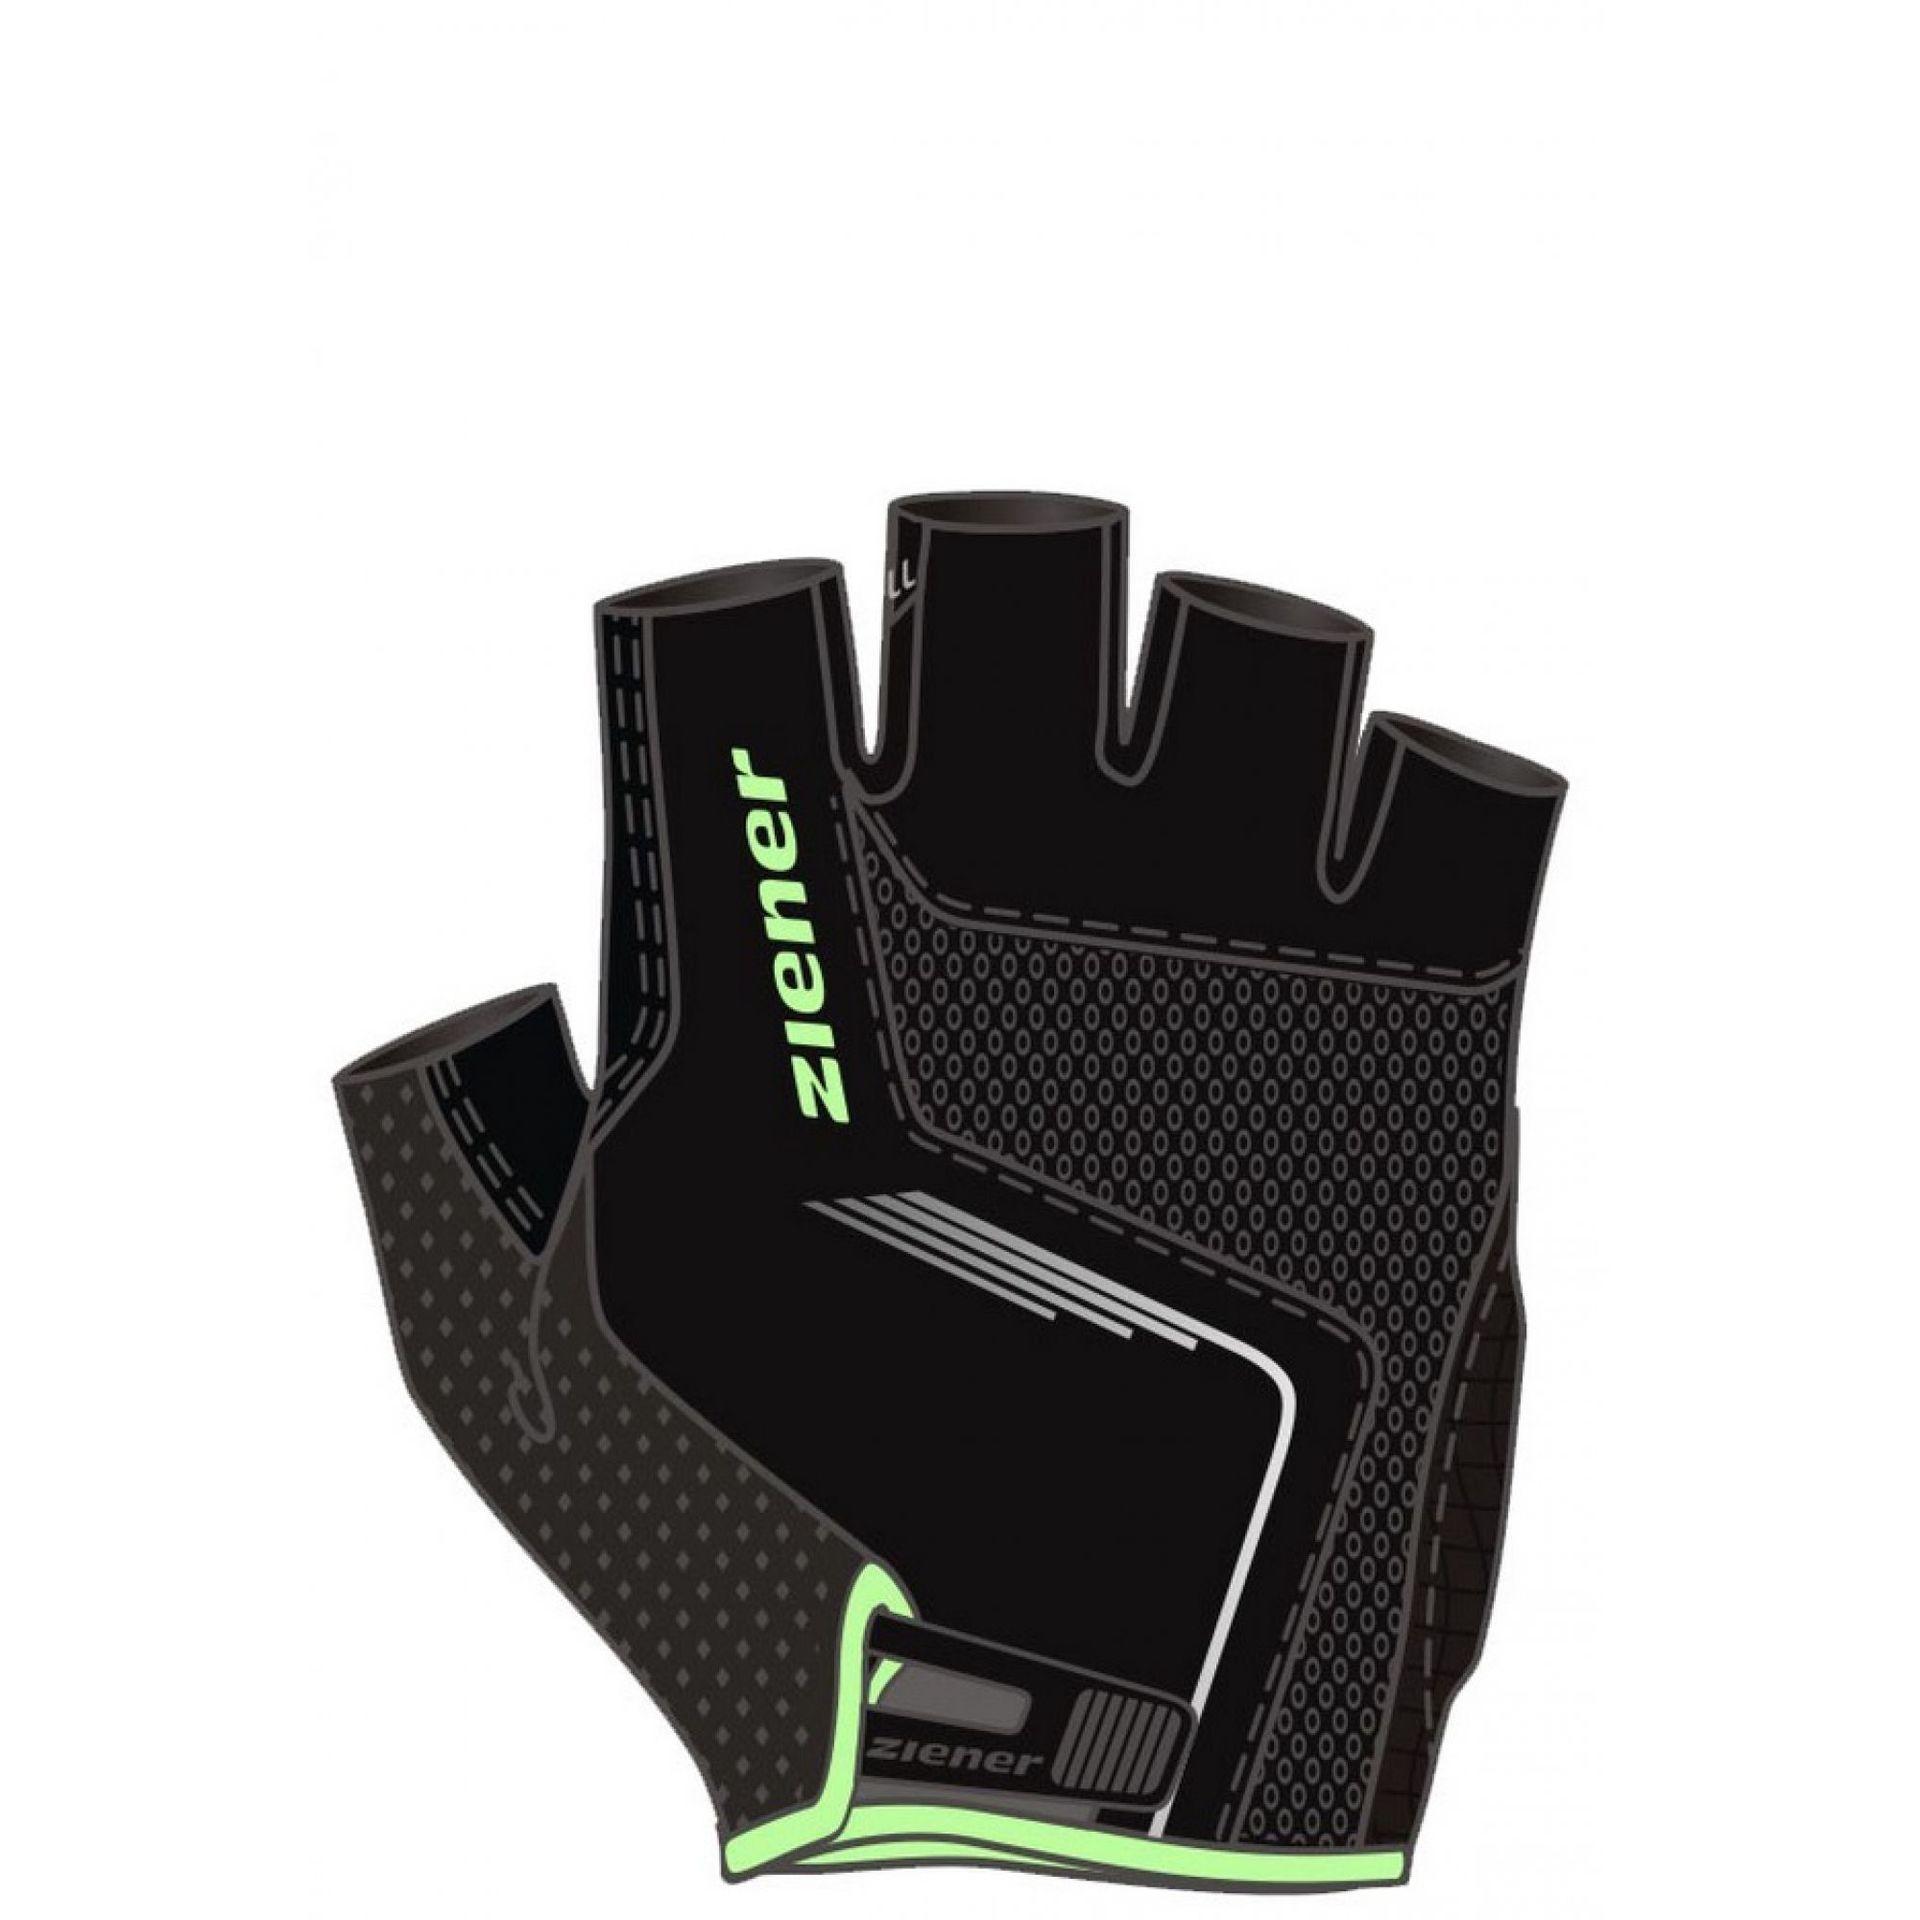 Rękawiczki rowerowe Ziener Cavel